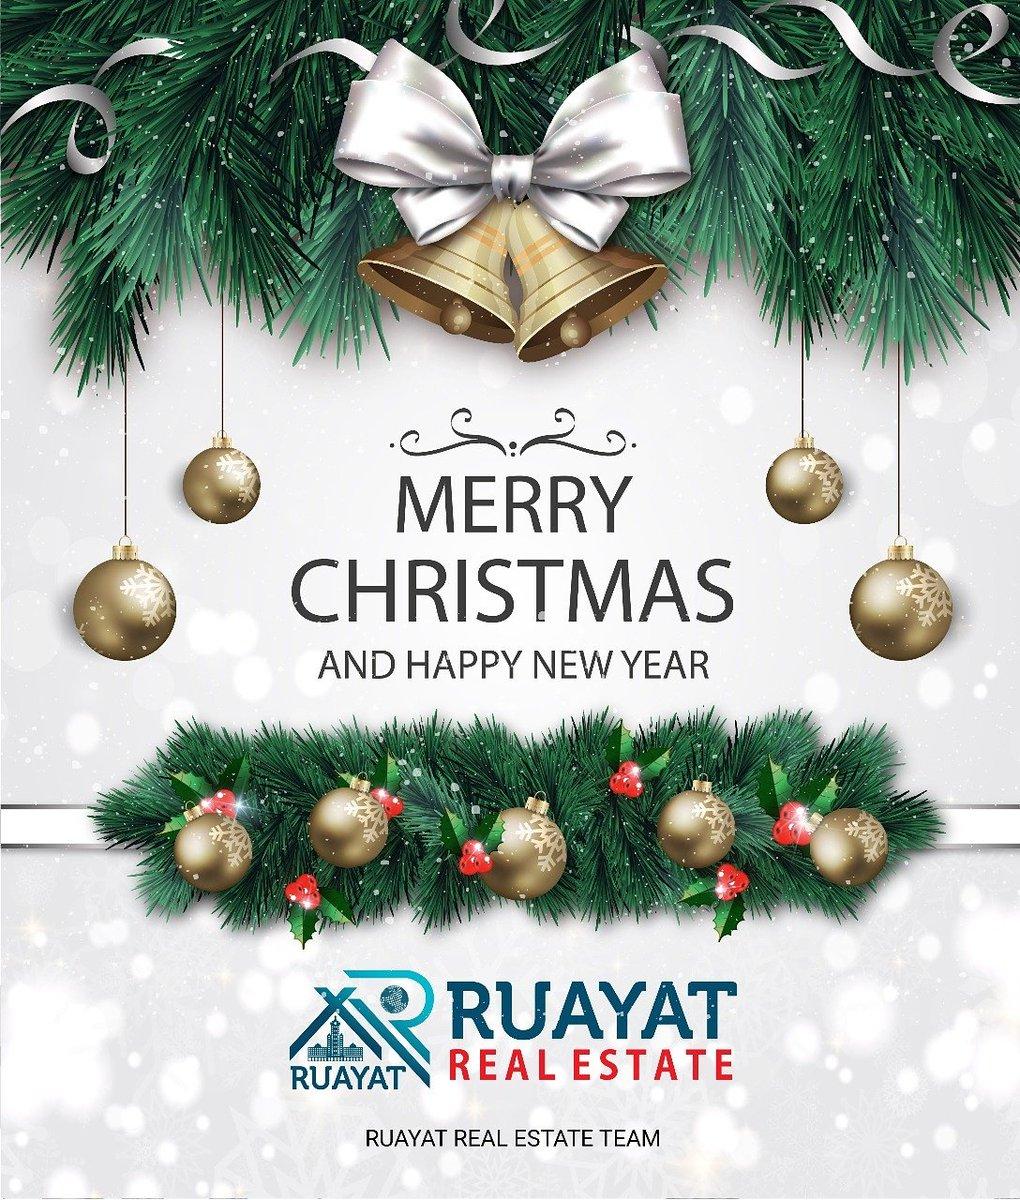 Aysha Tulabing On Twitter Greetings From Ruayat Real Estate